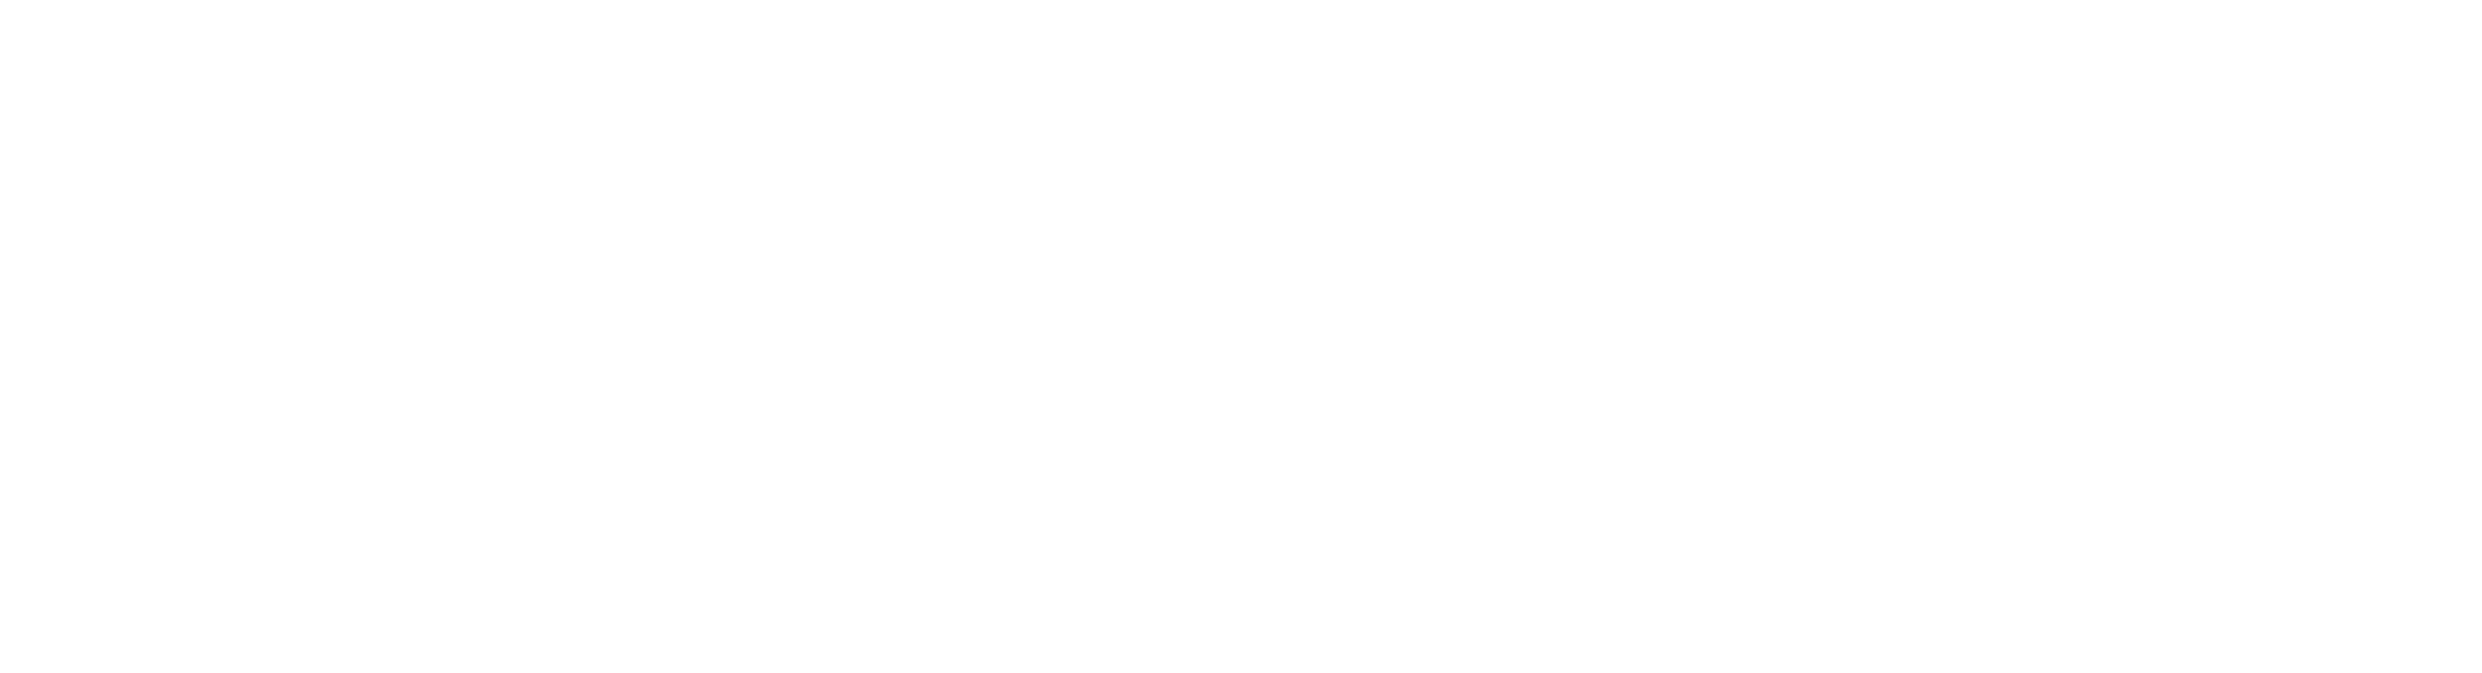 jackson-insurance-logo-white.png